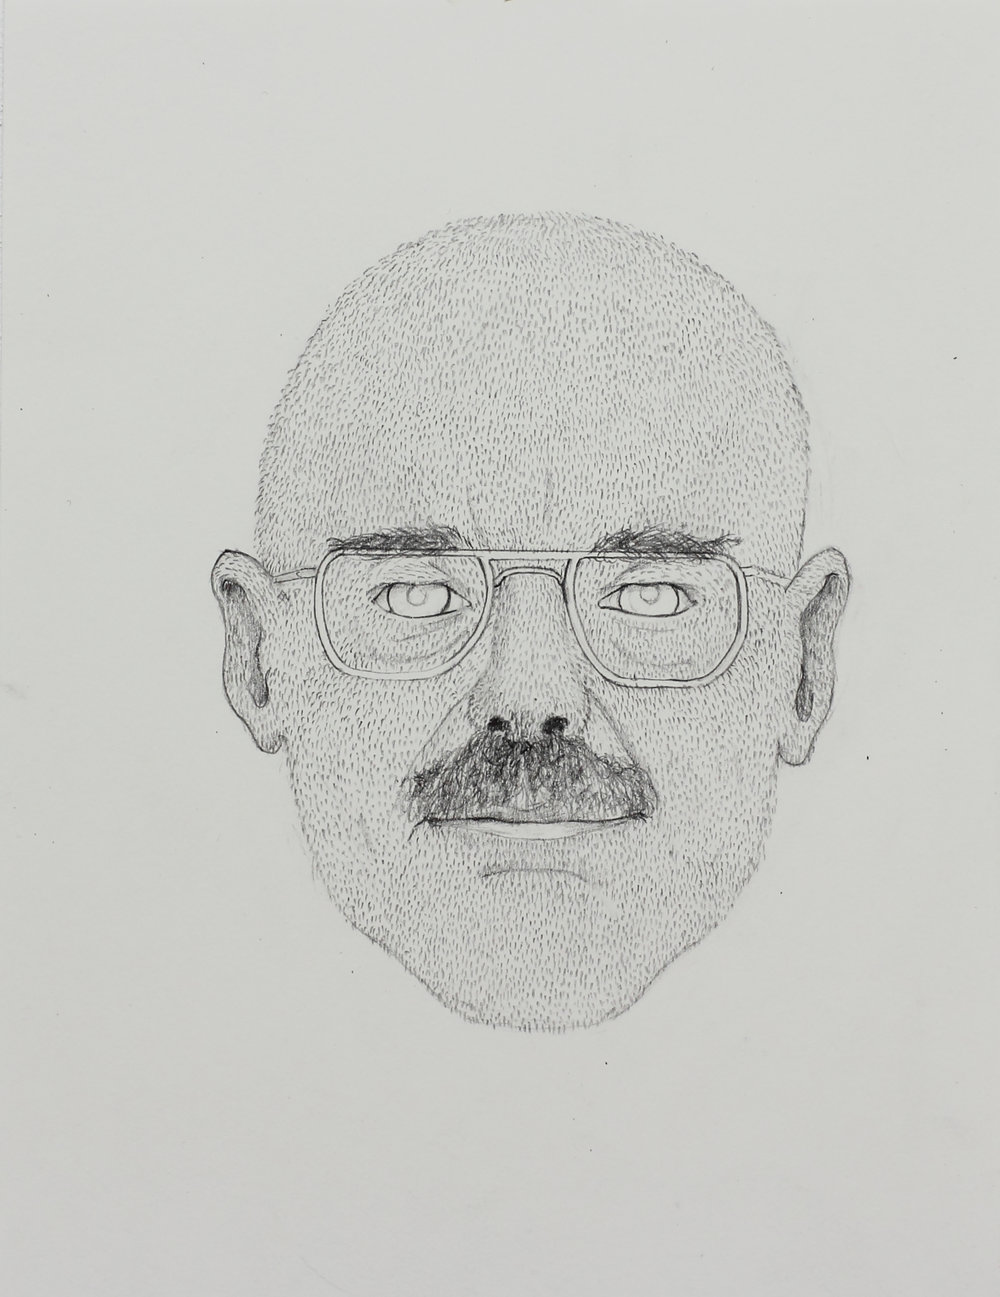 Retrato anónimo